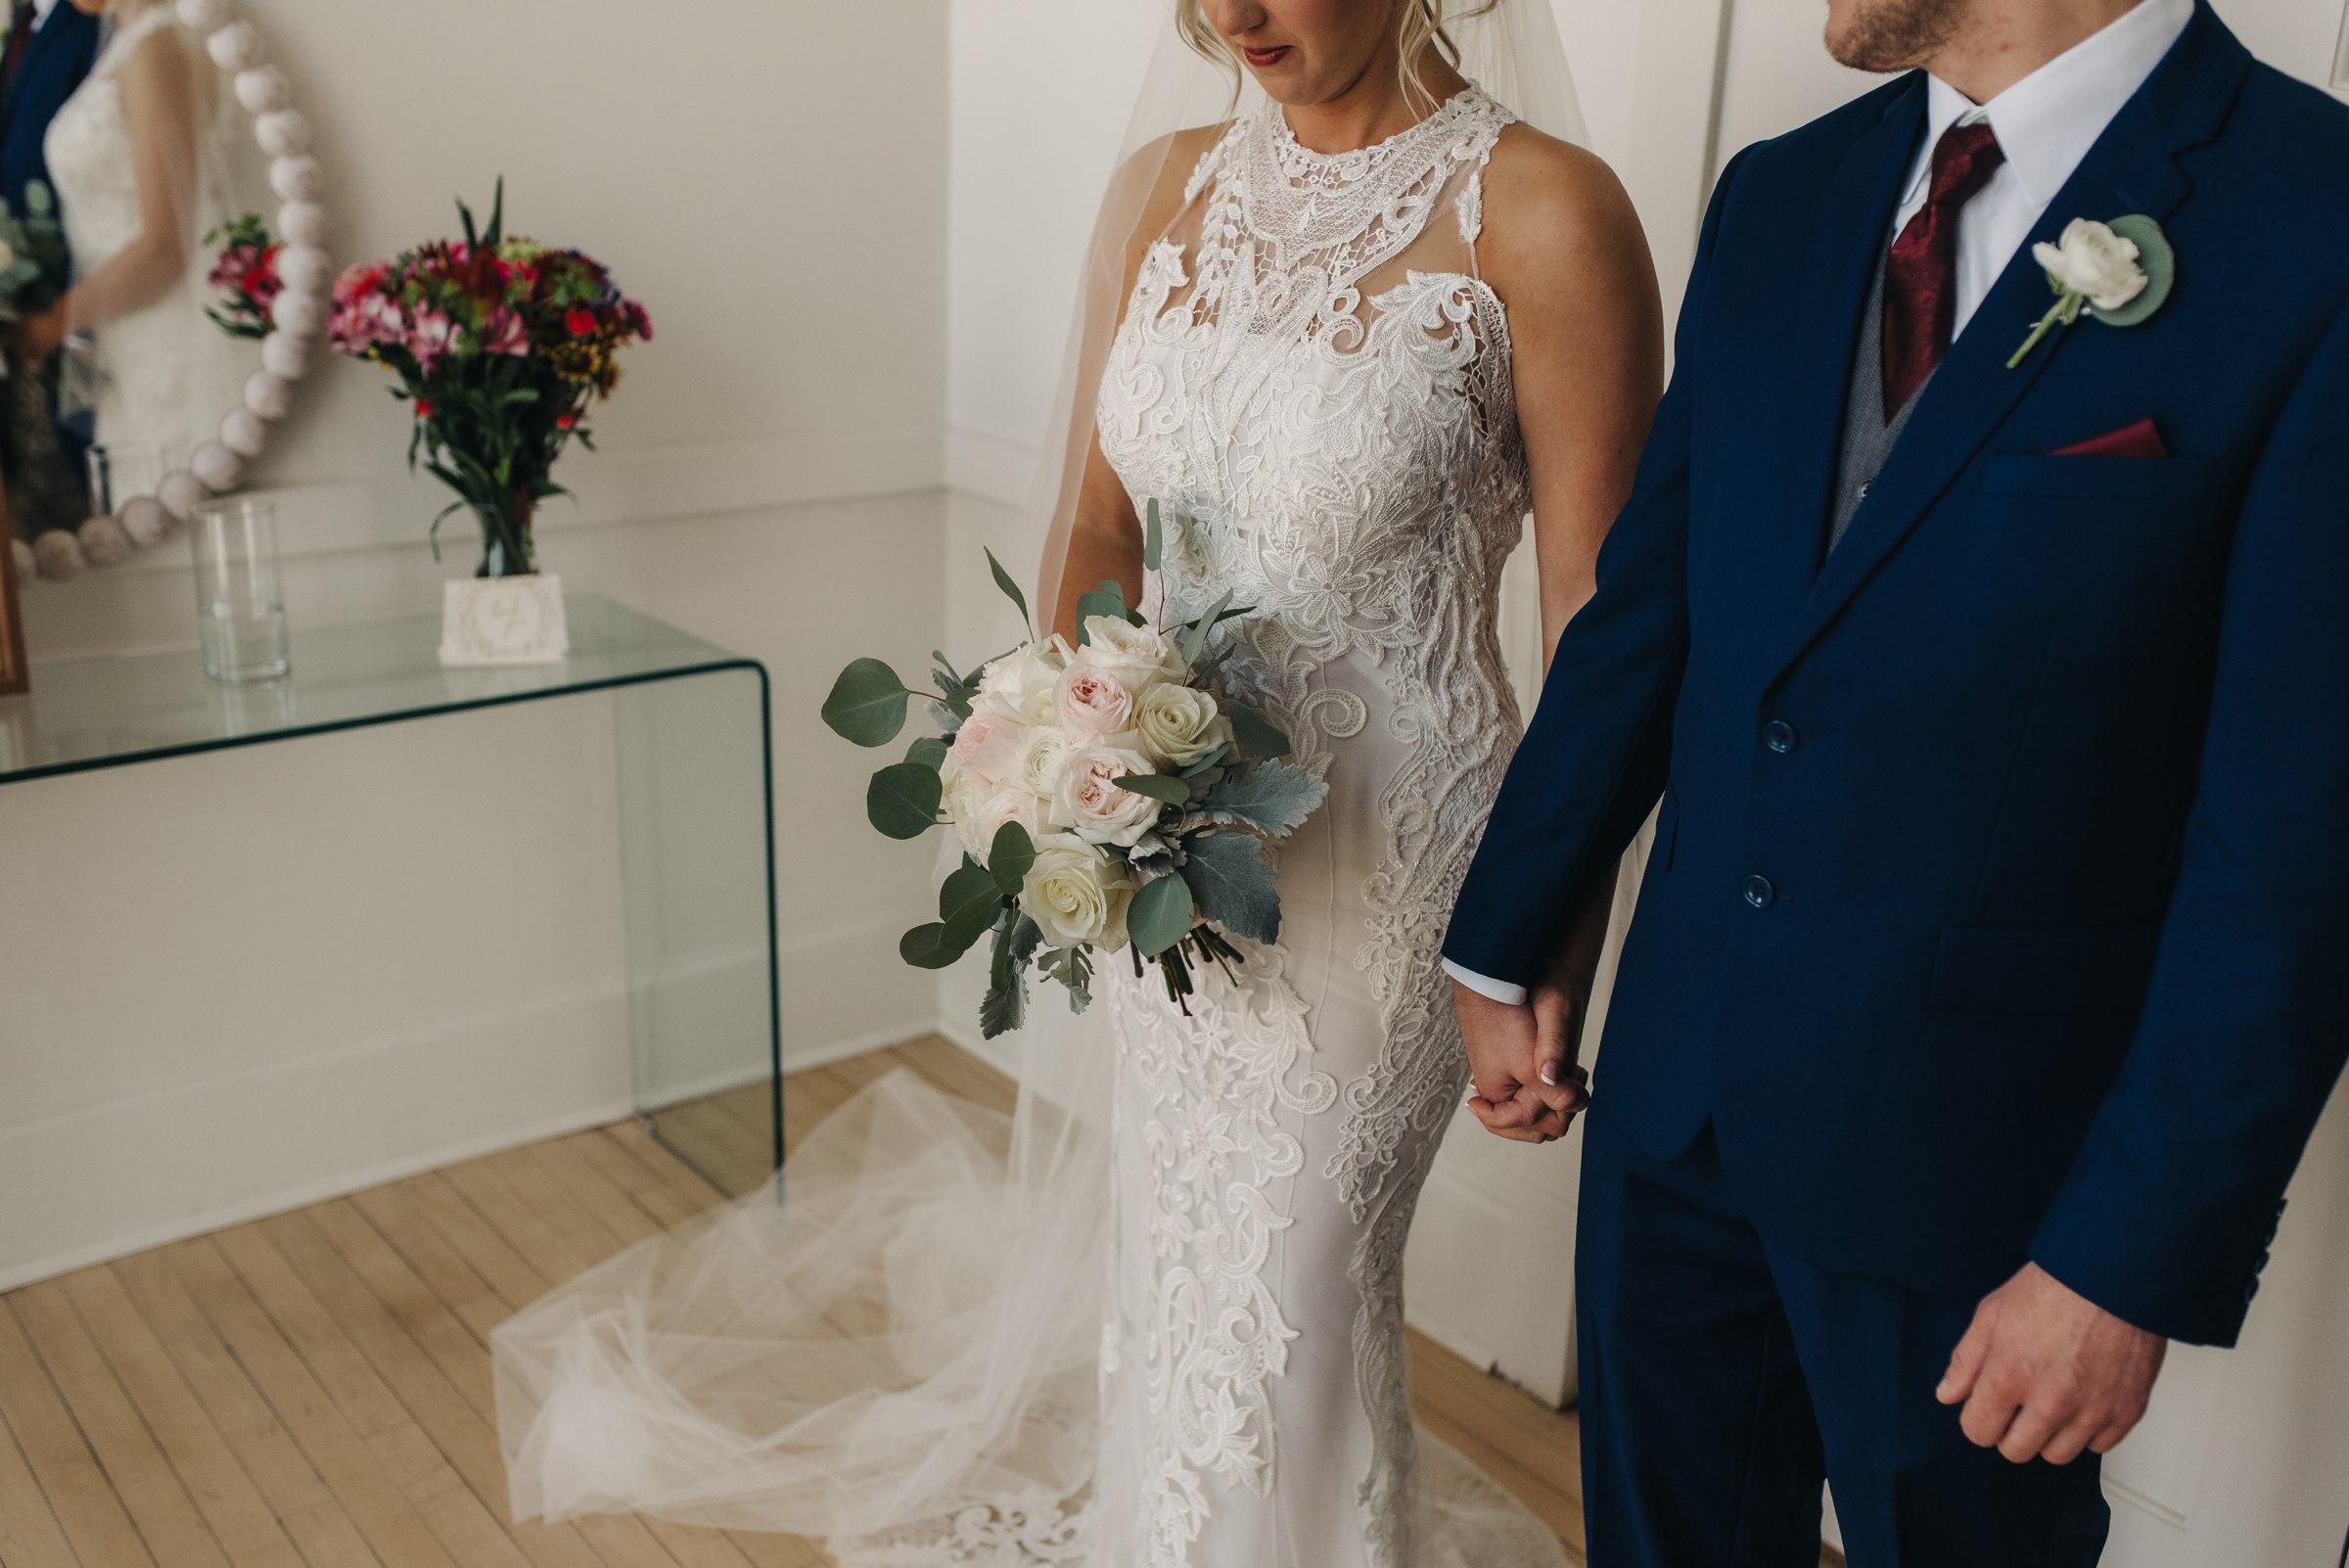 elopement-photographer-austin-best-wedding-minneapolis-adventurous-wedding-modern-morocco-new york-new orleans-mexica-costa rica-italy-affordable-best_0045.jpg